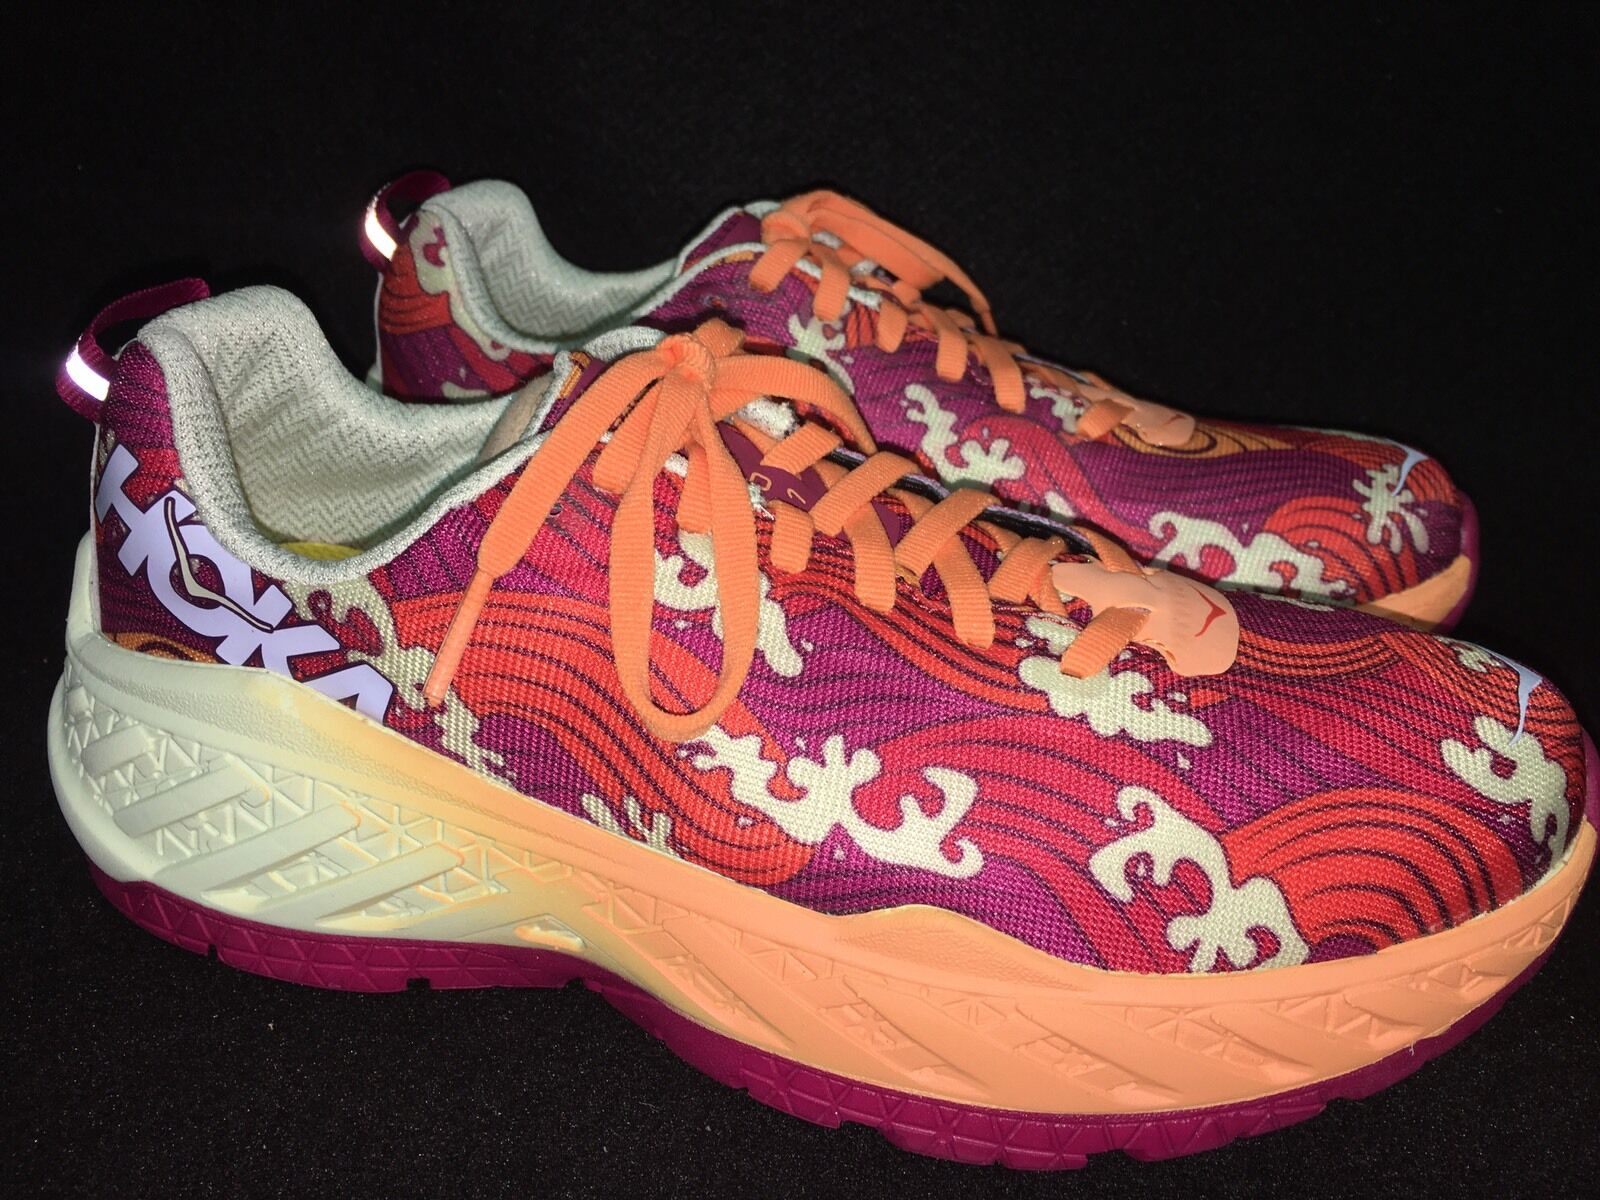 Hoka One One Kona Clayton 2 Tangerine Tango Orange Running Tennis Shoes 1019678